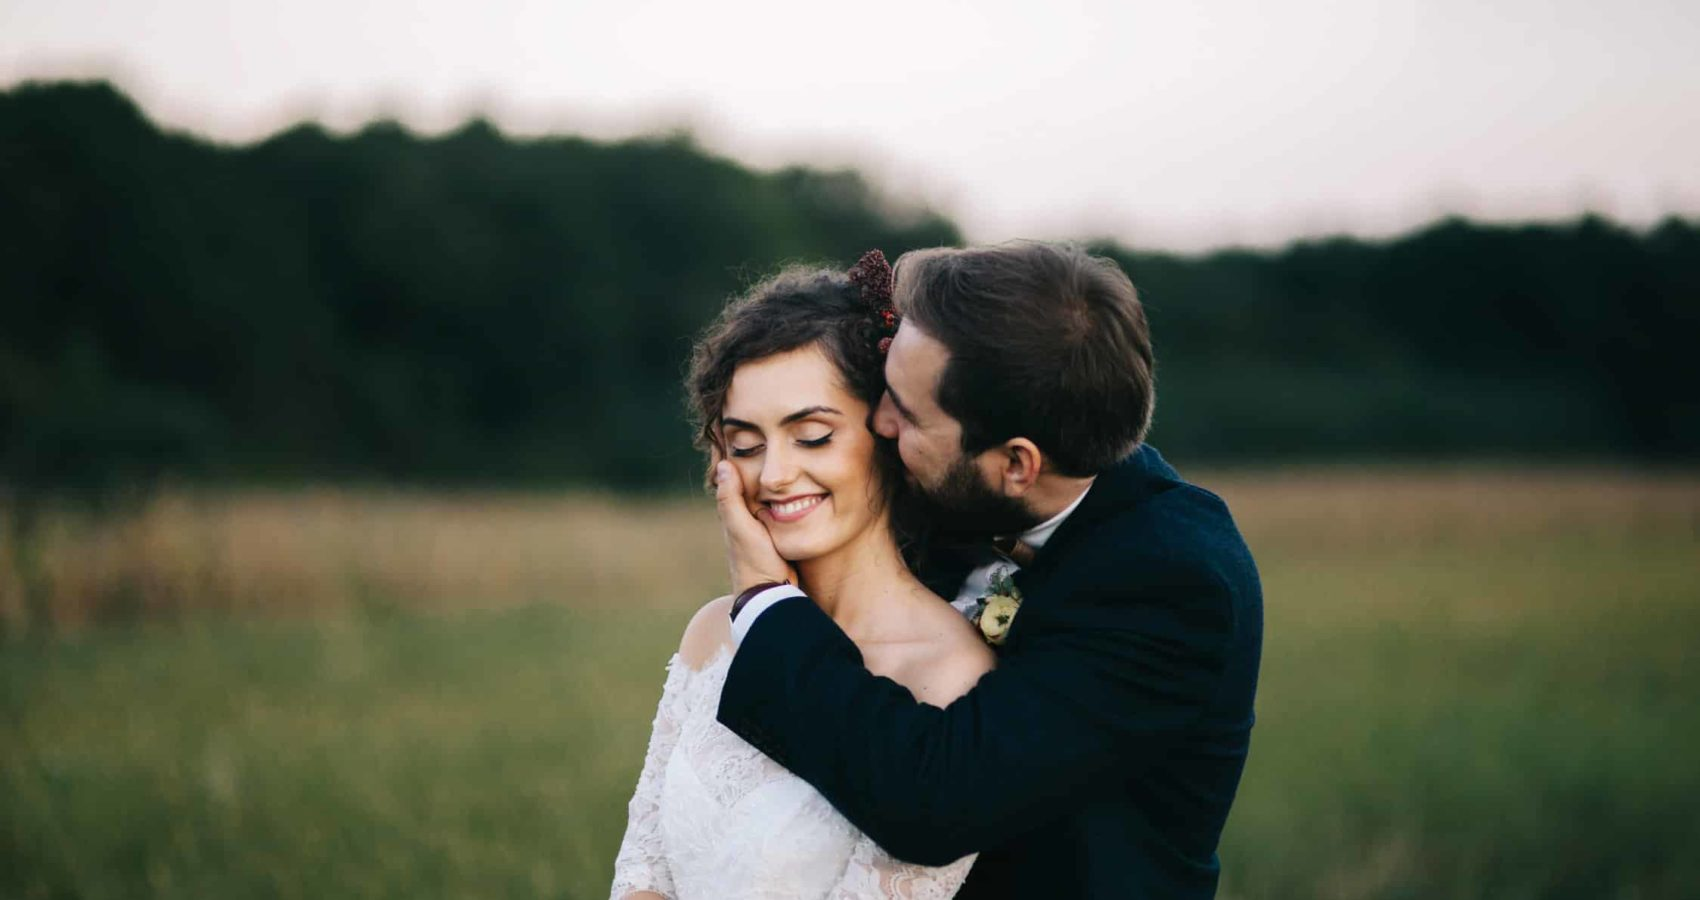 Outdoor bohemian wedding by London wedding photographers